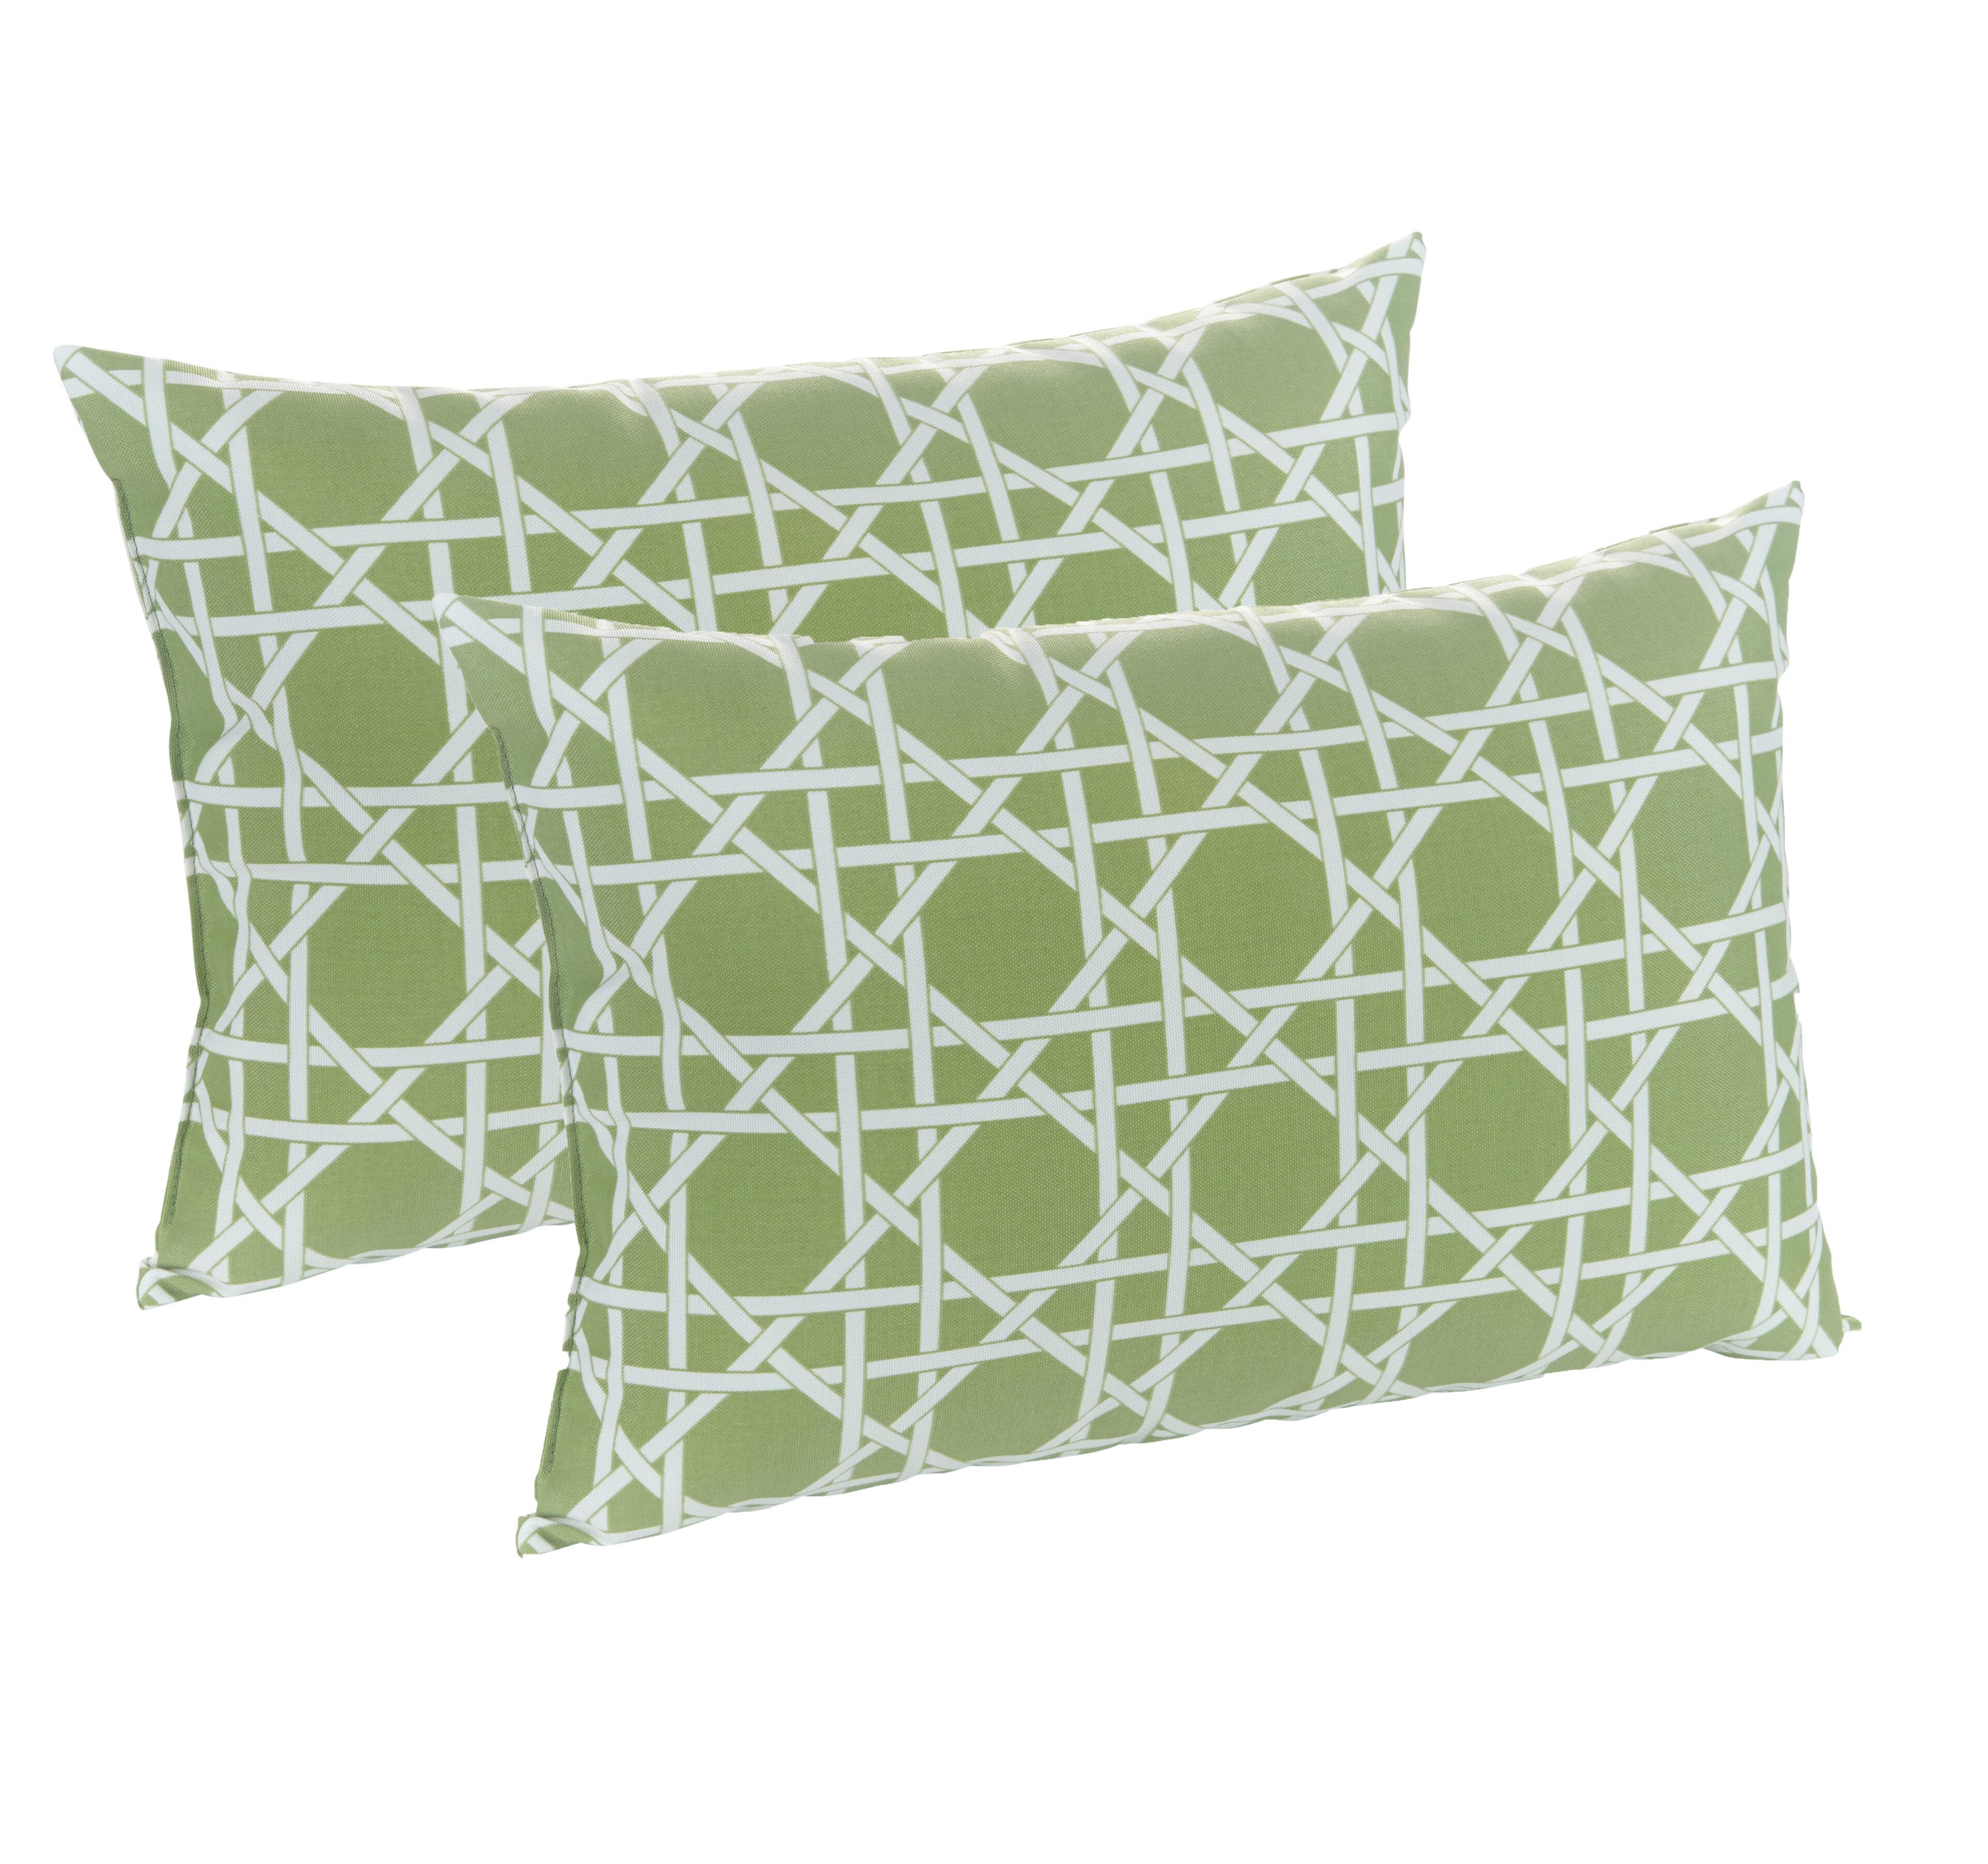 pdp indooroutdoor marissa home lumbar pillows pillow outdoor decor indoor